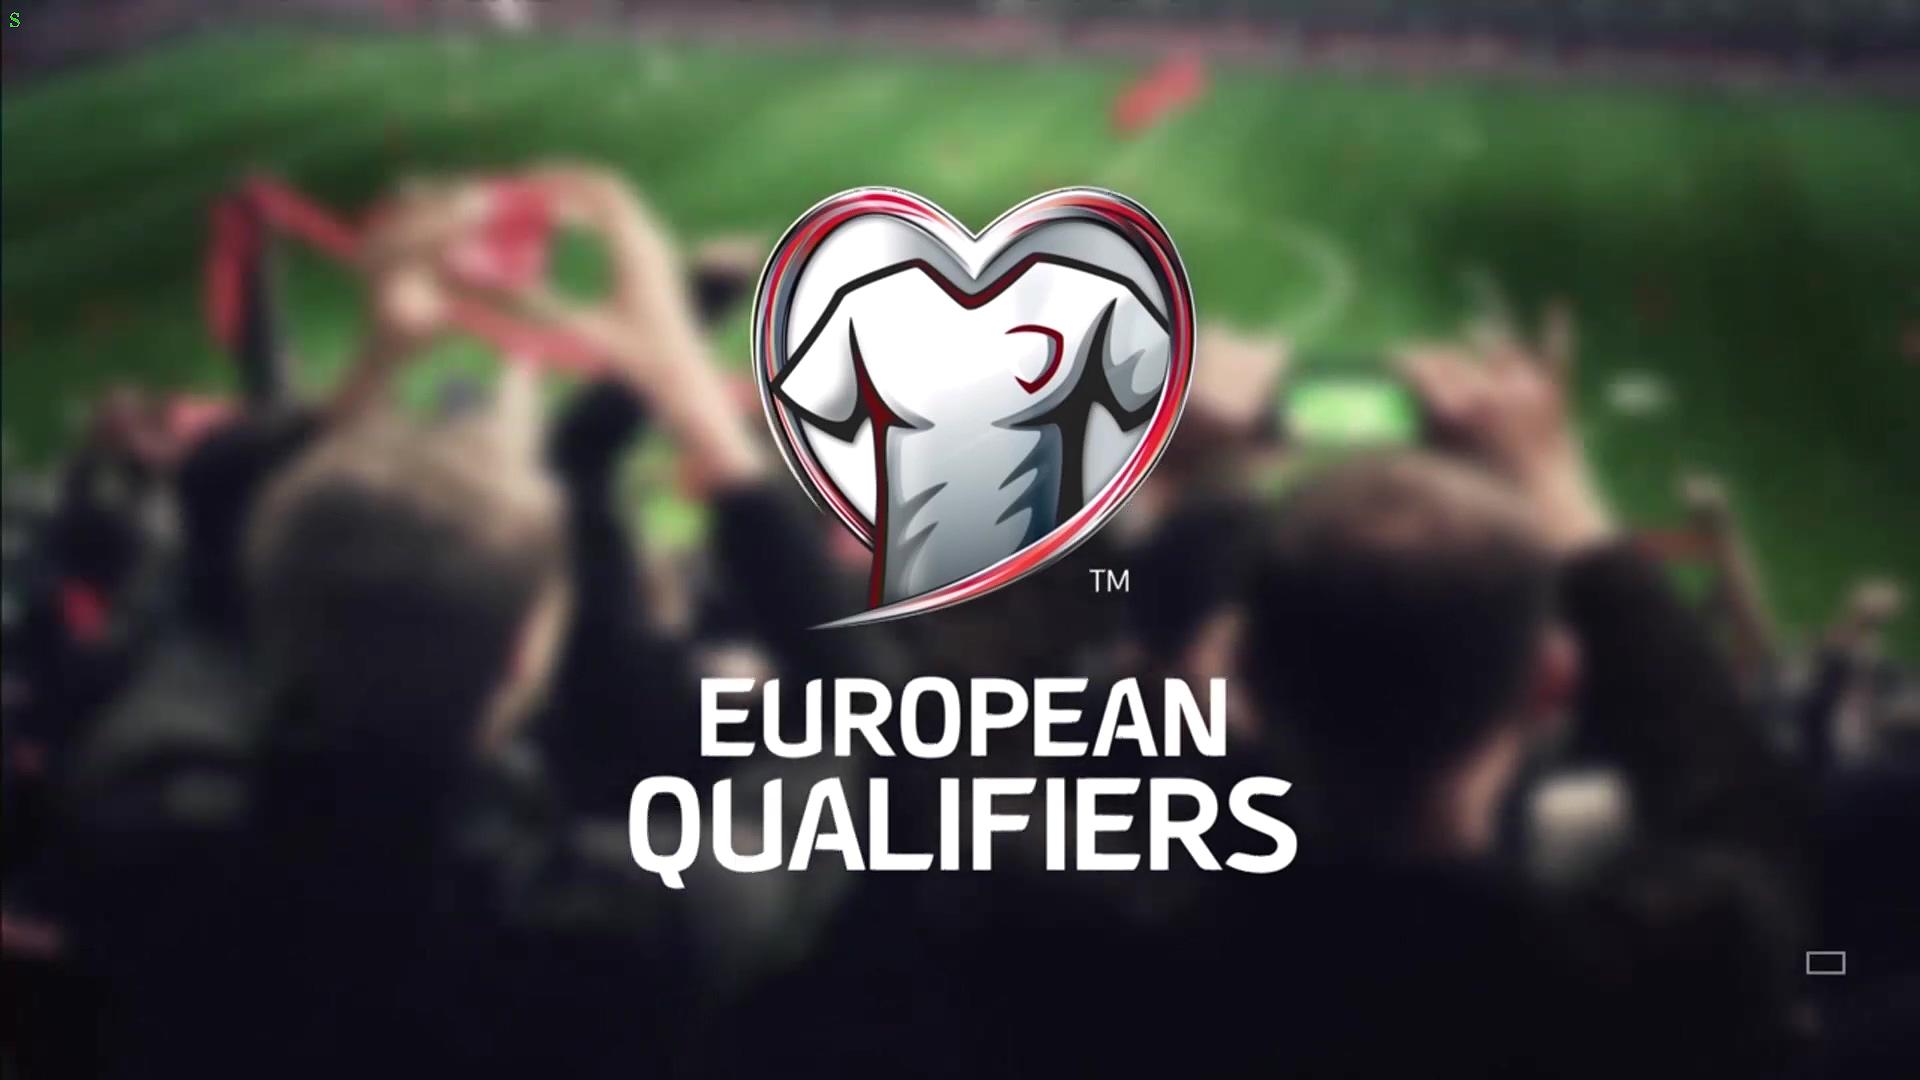 Uefa Calendrier 2020.Futbol Uefa Euro 2020 Qualifiers Highlights 26 03 2019